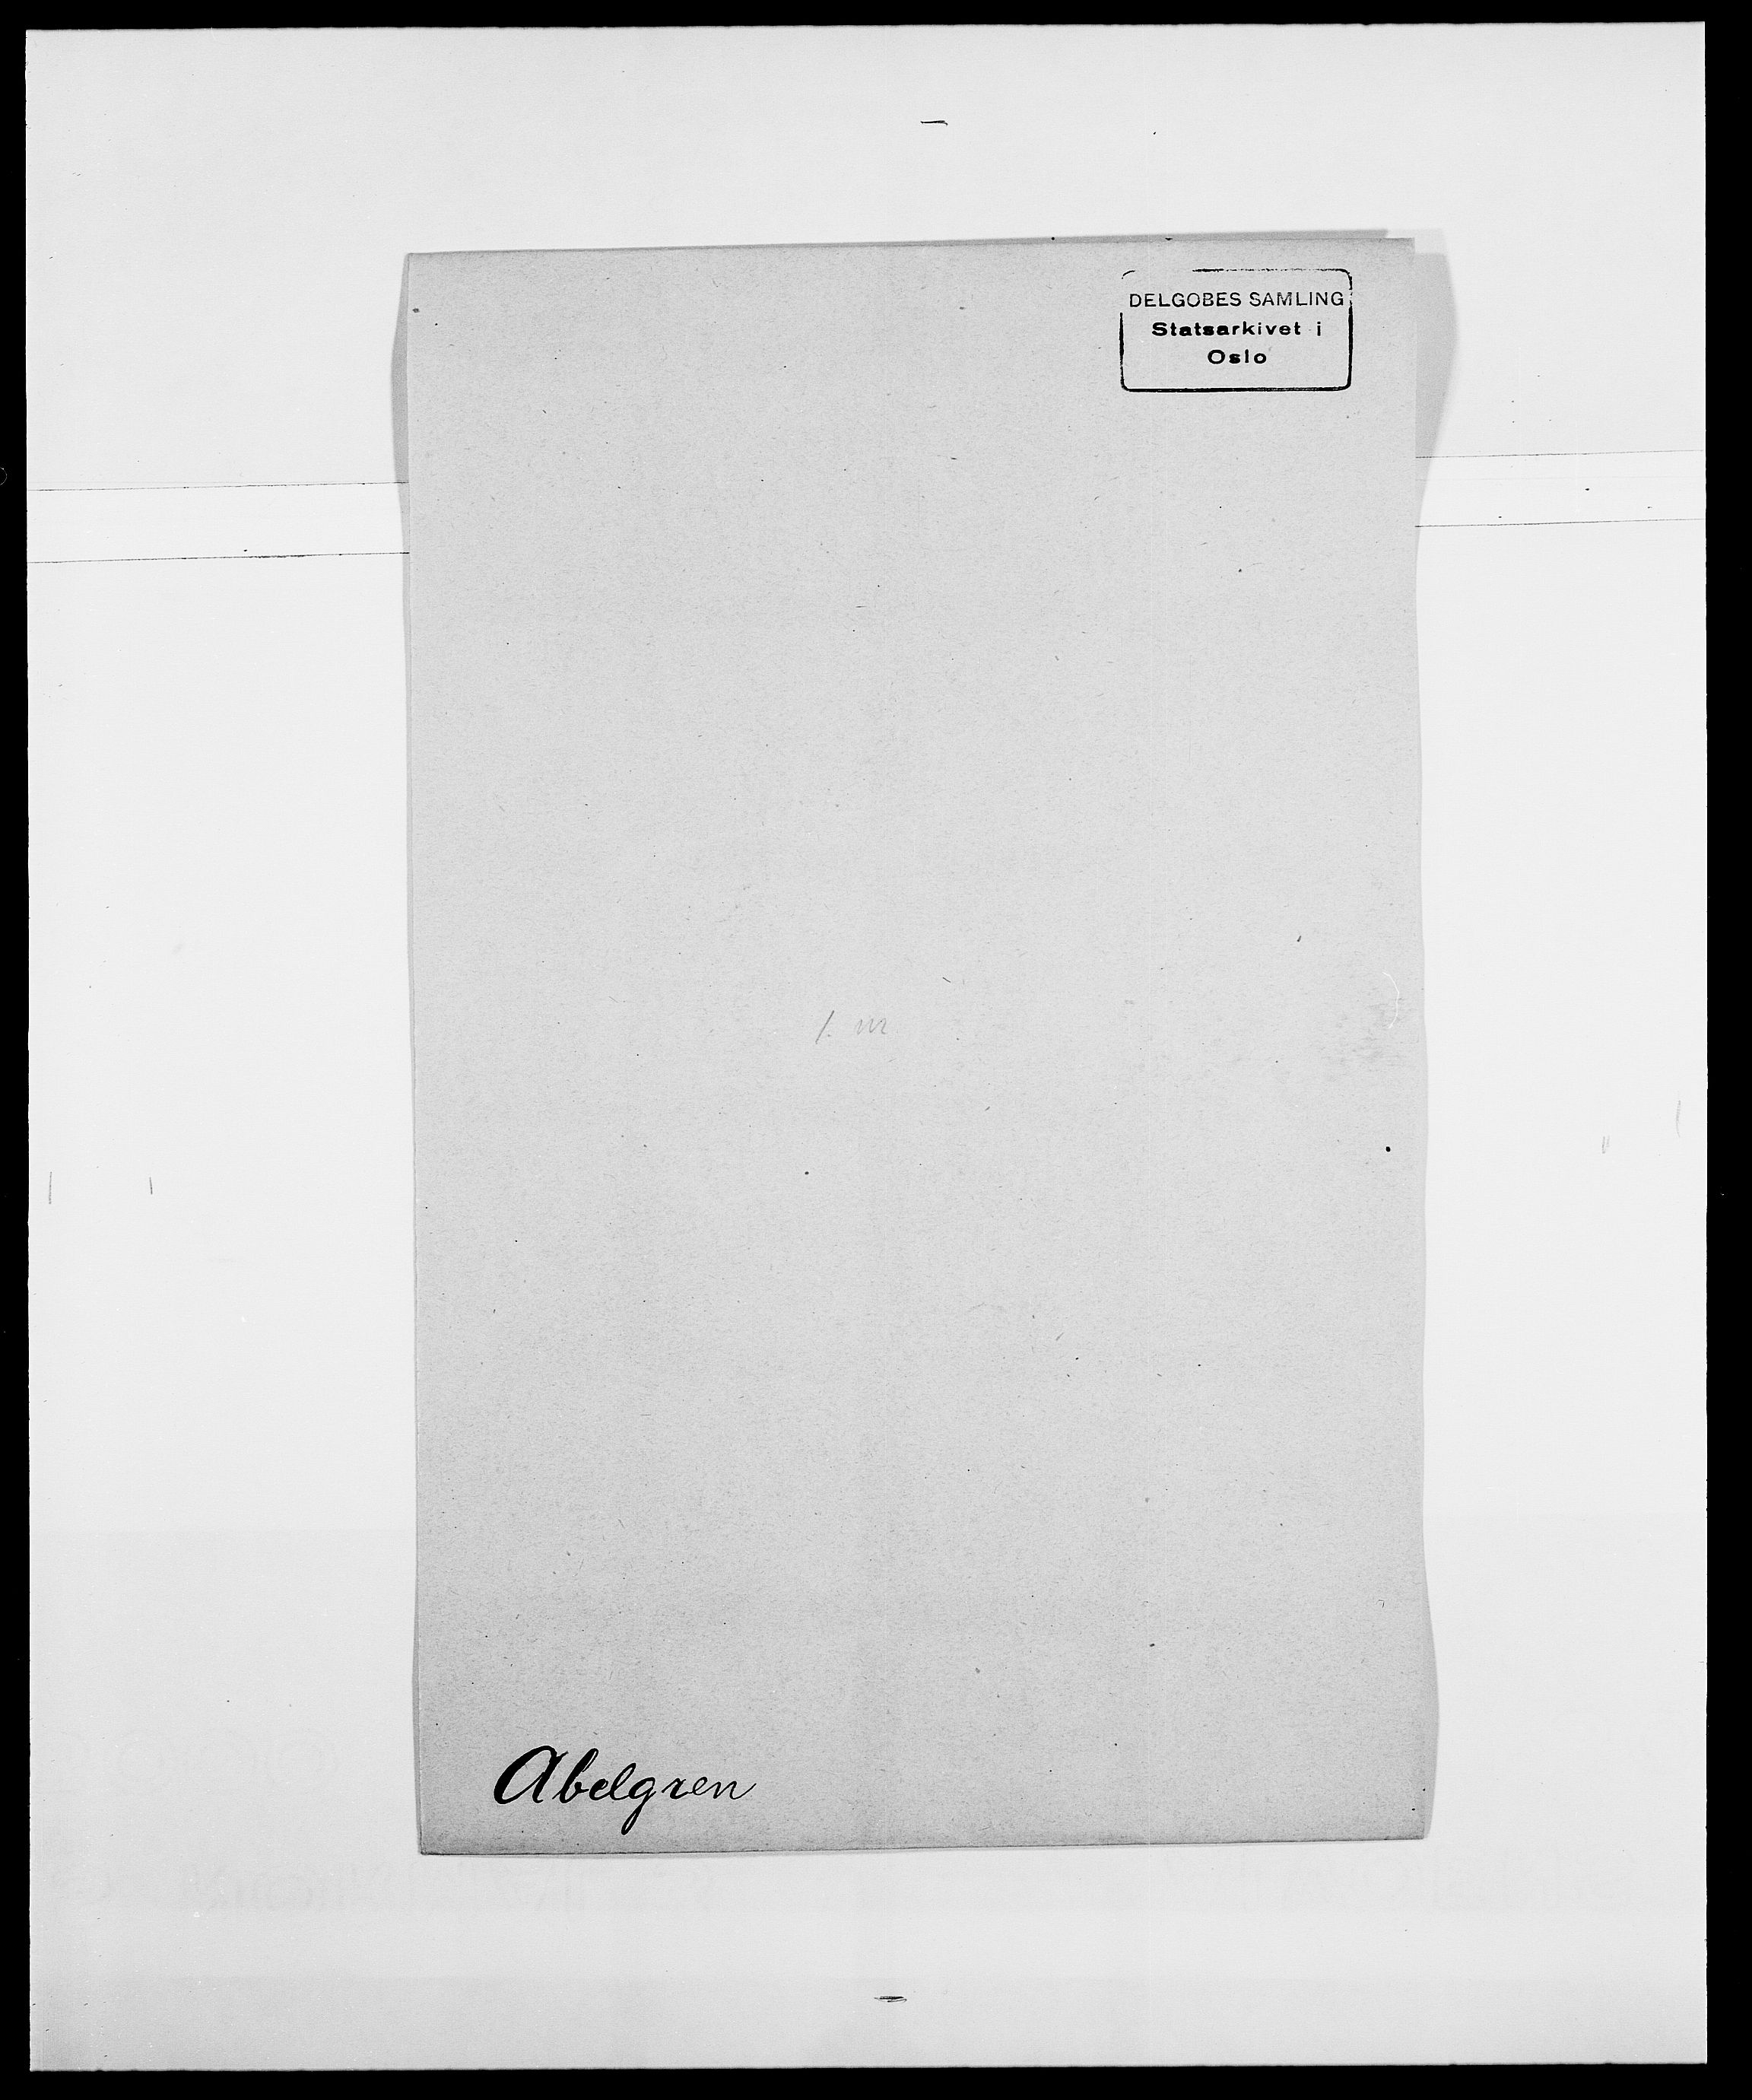 SAO, Delgobe, Charles Antoine - samling, D/Da/L0001: Aabye - Angerman, s. 169